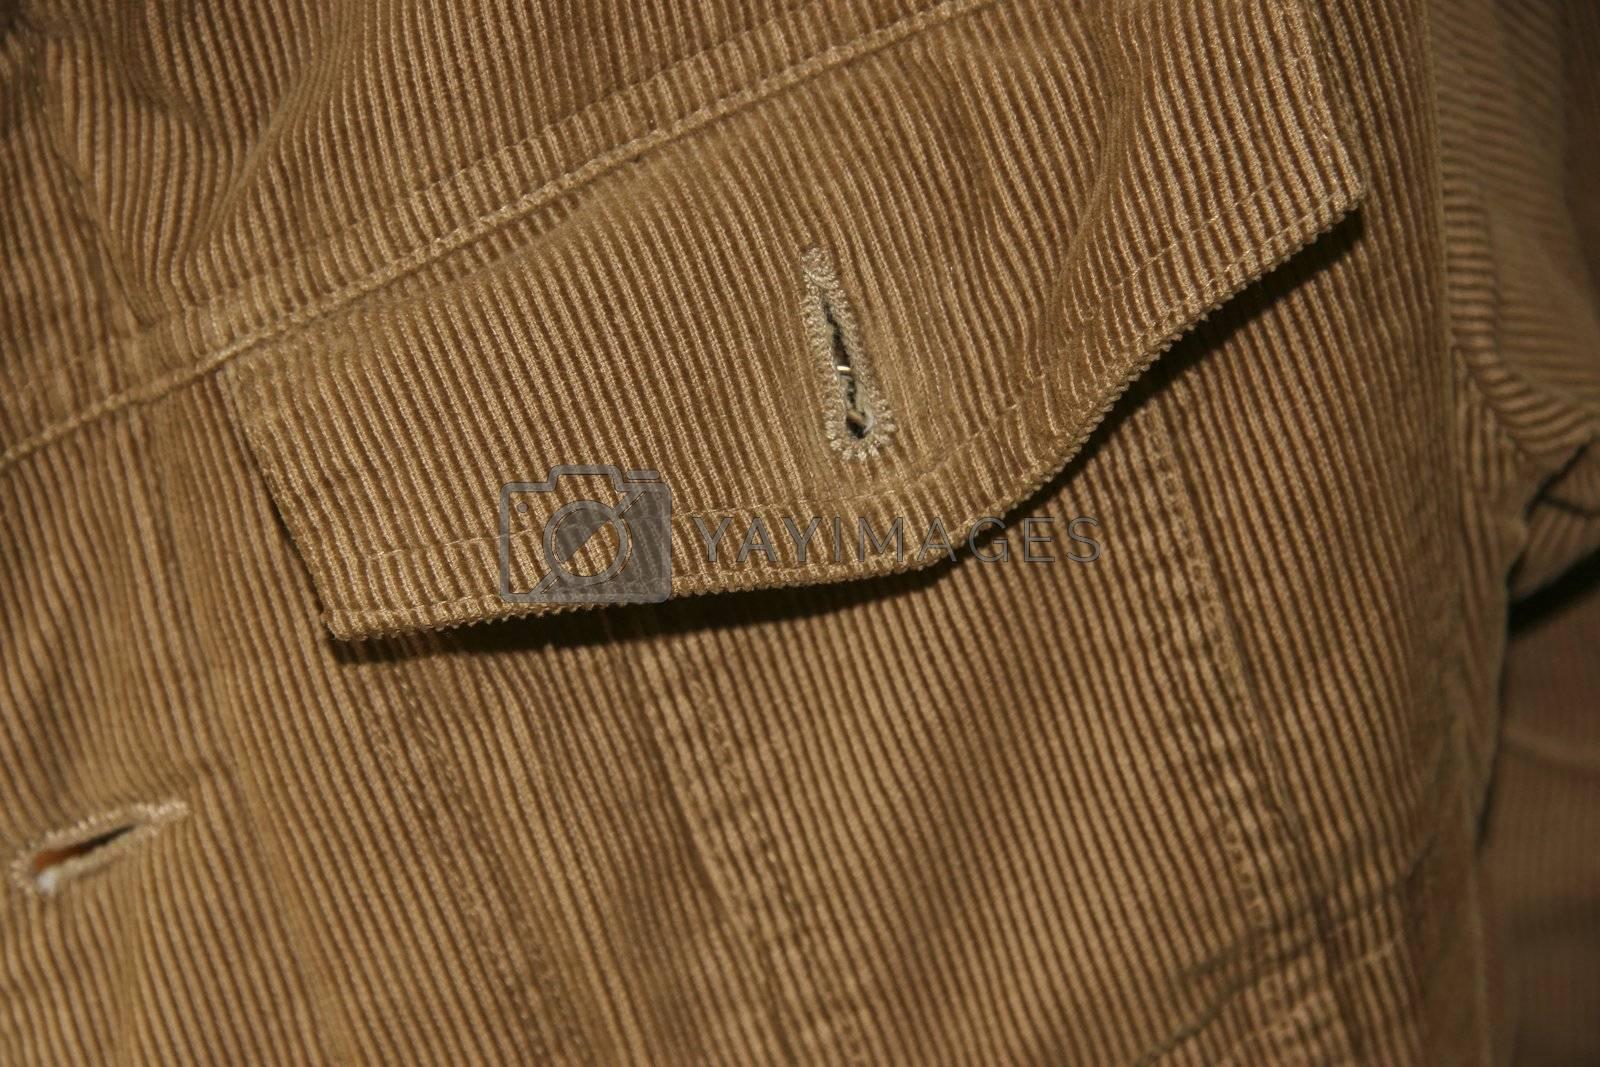 close-up of a denim jacket